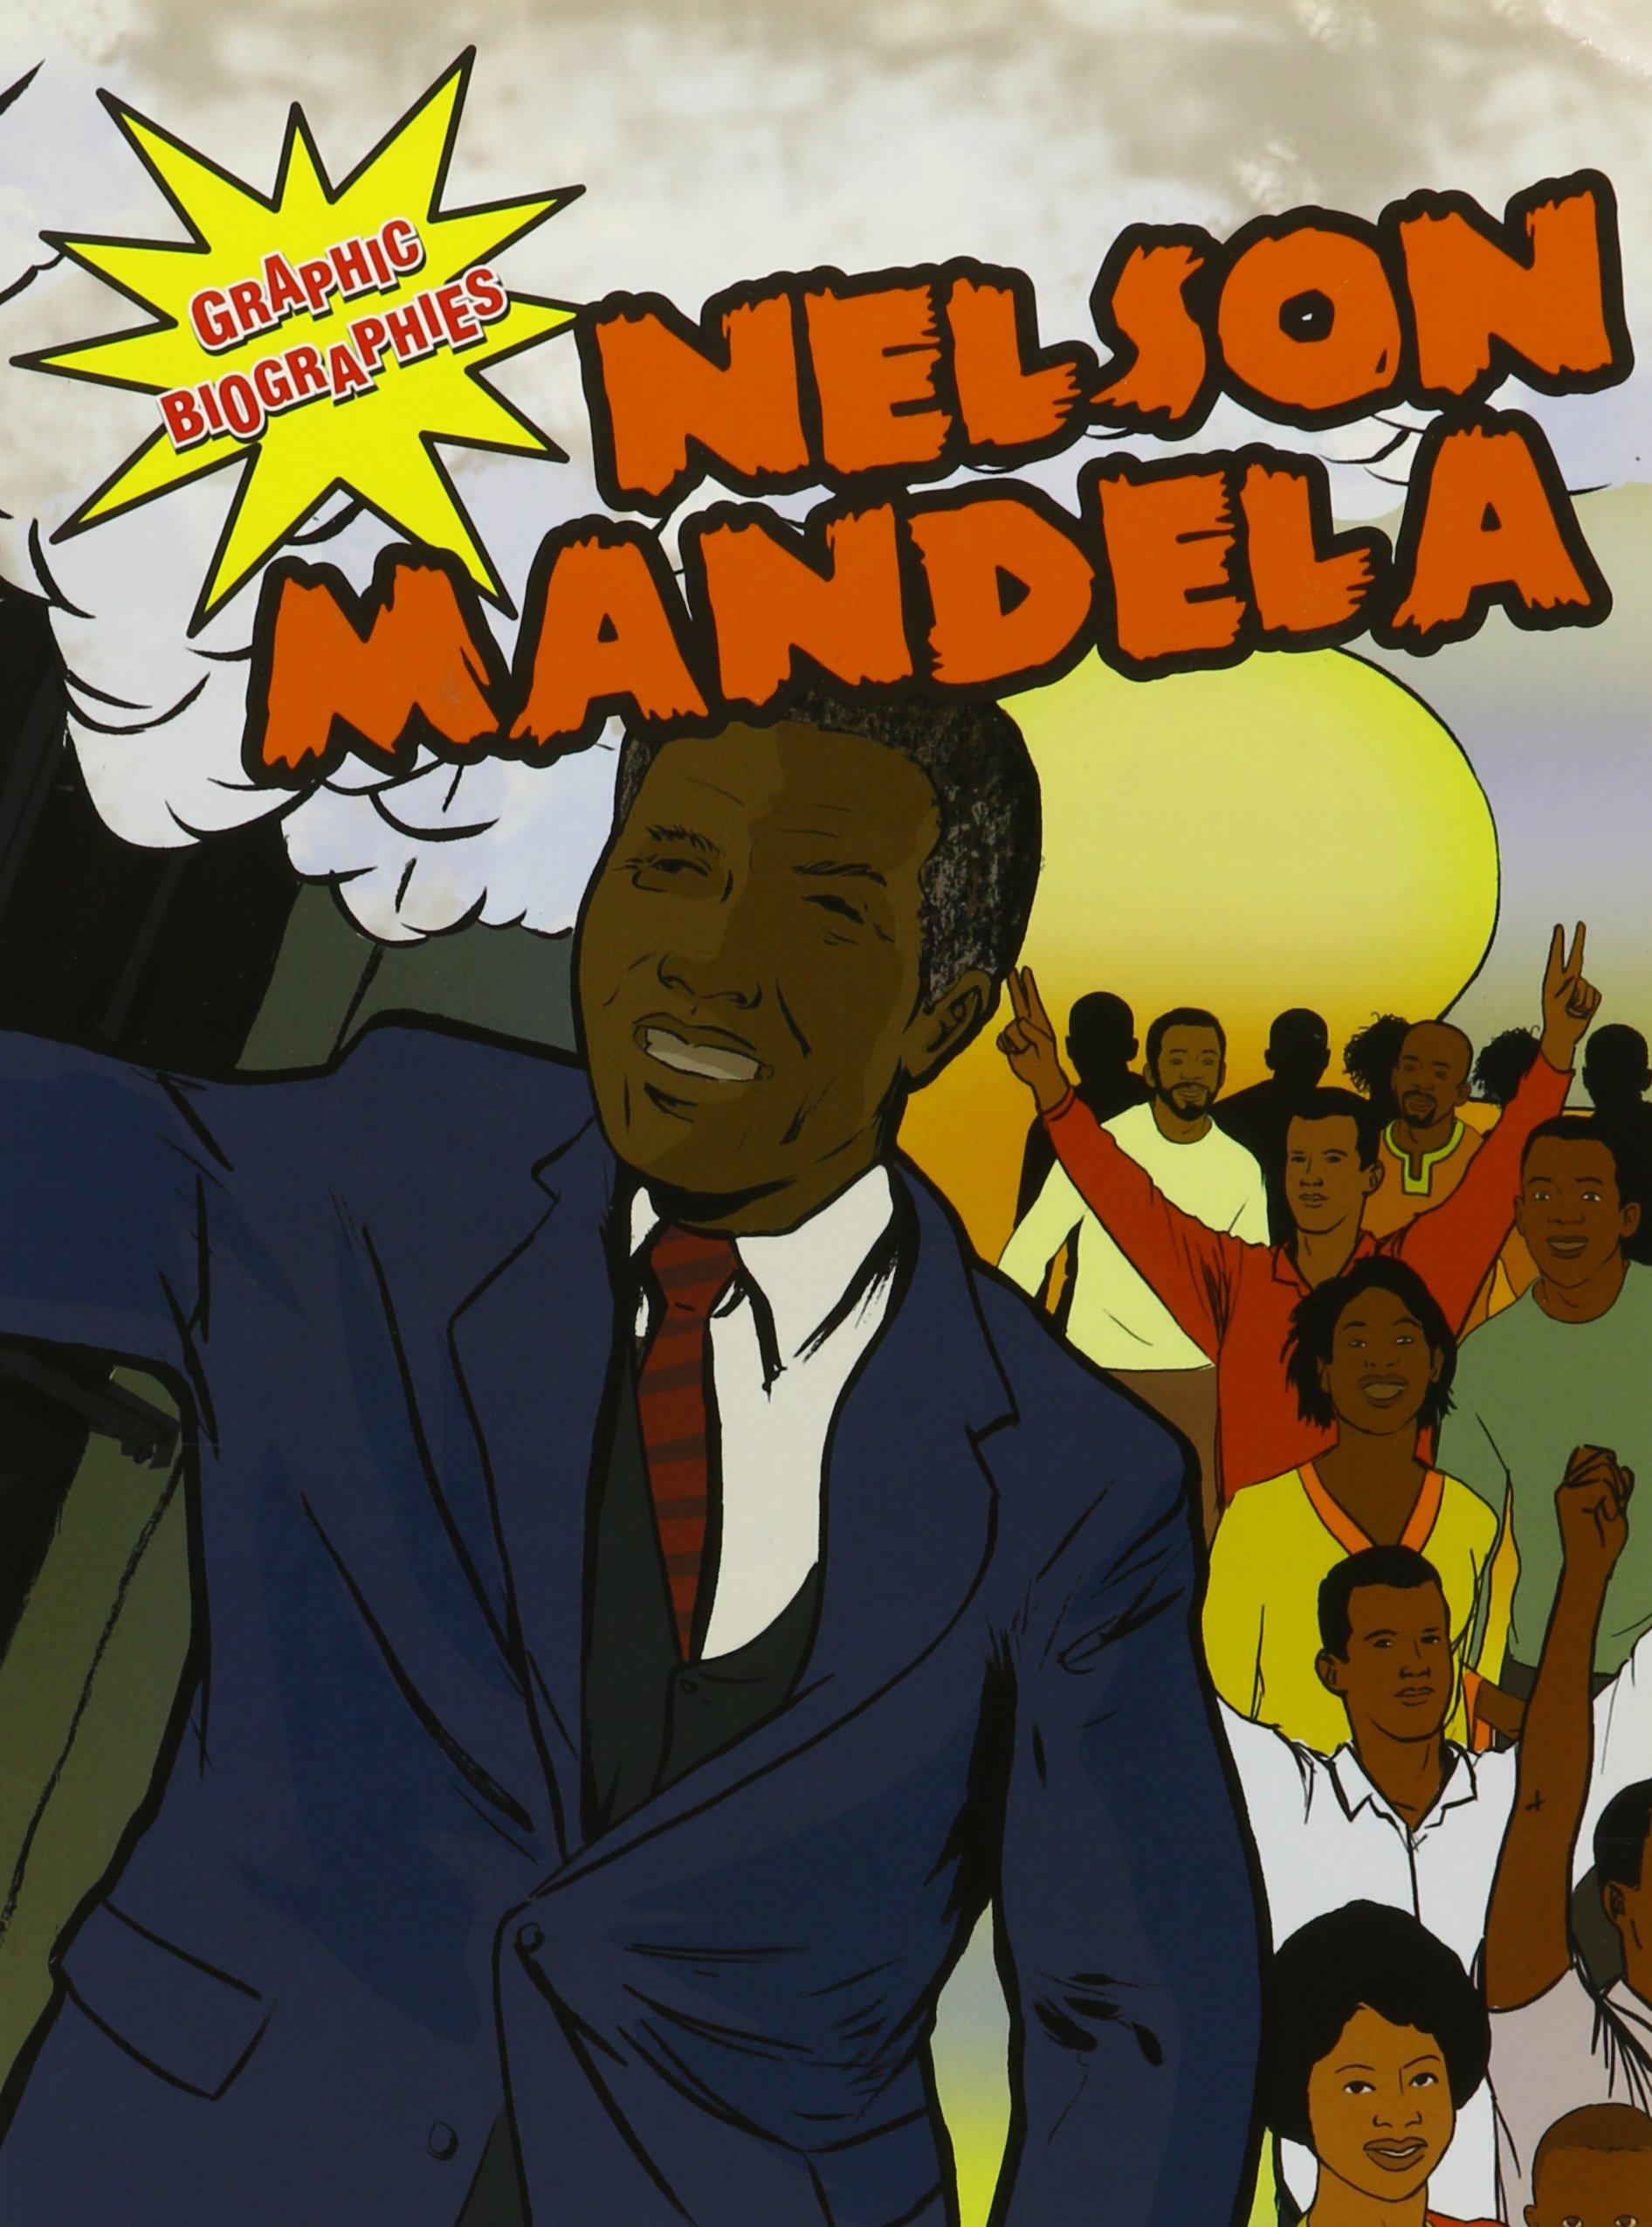 Nelson Mandela (Graphic Biographies (World Almanac) (Graphic Novels))